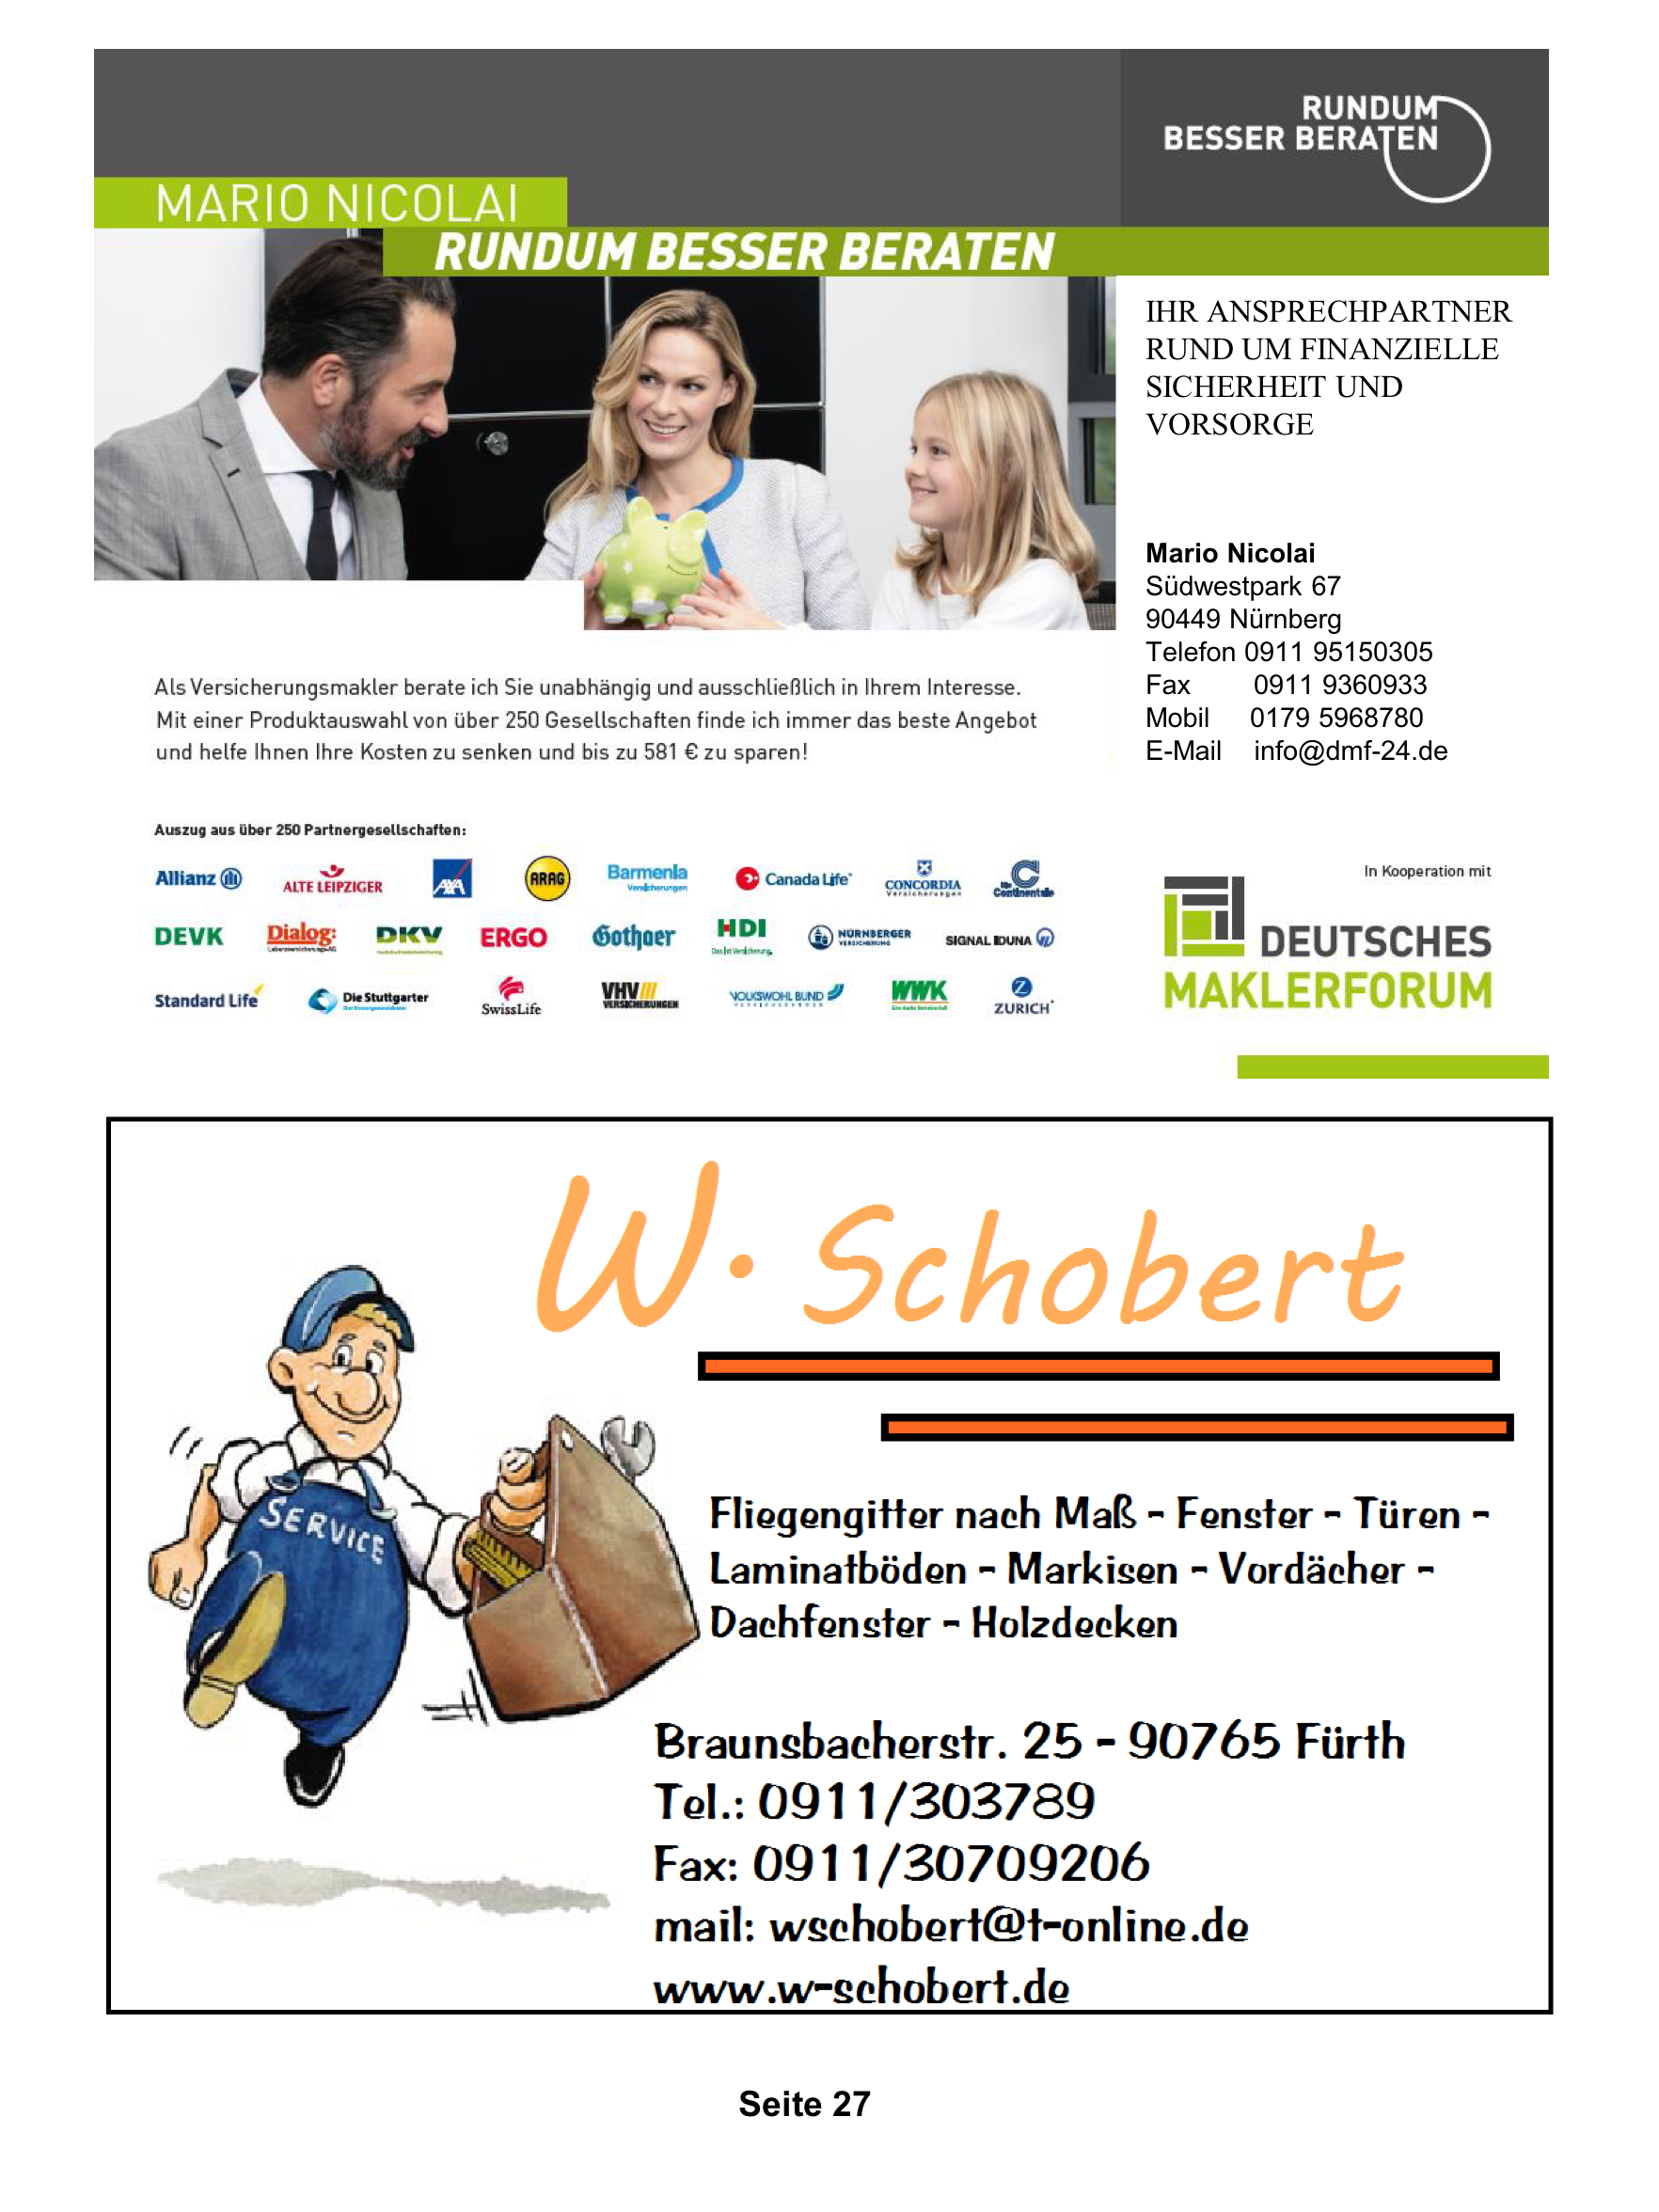 Diepersdorf-27.png